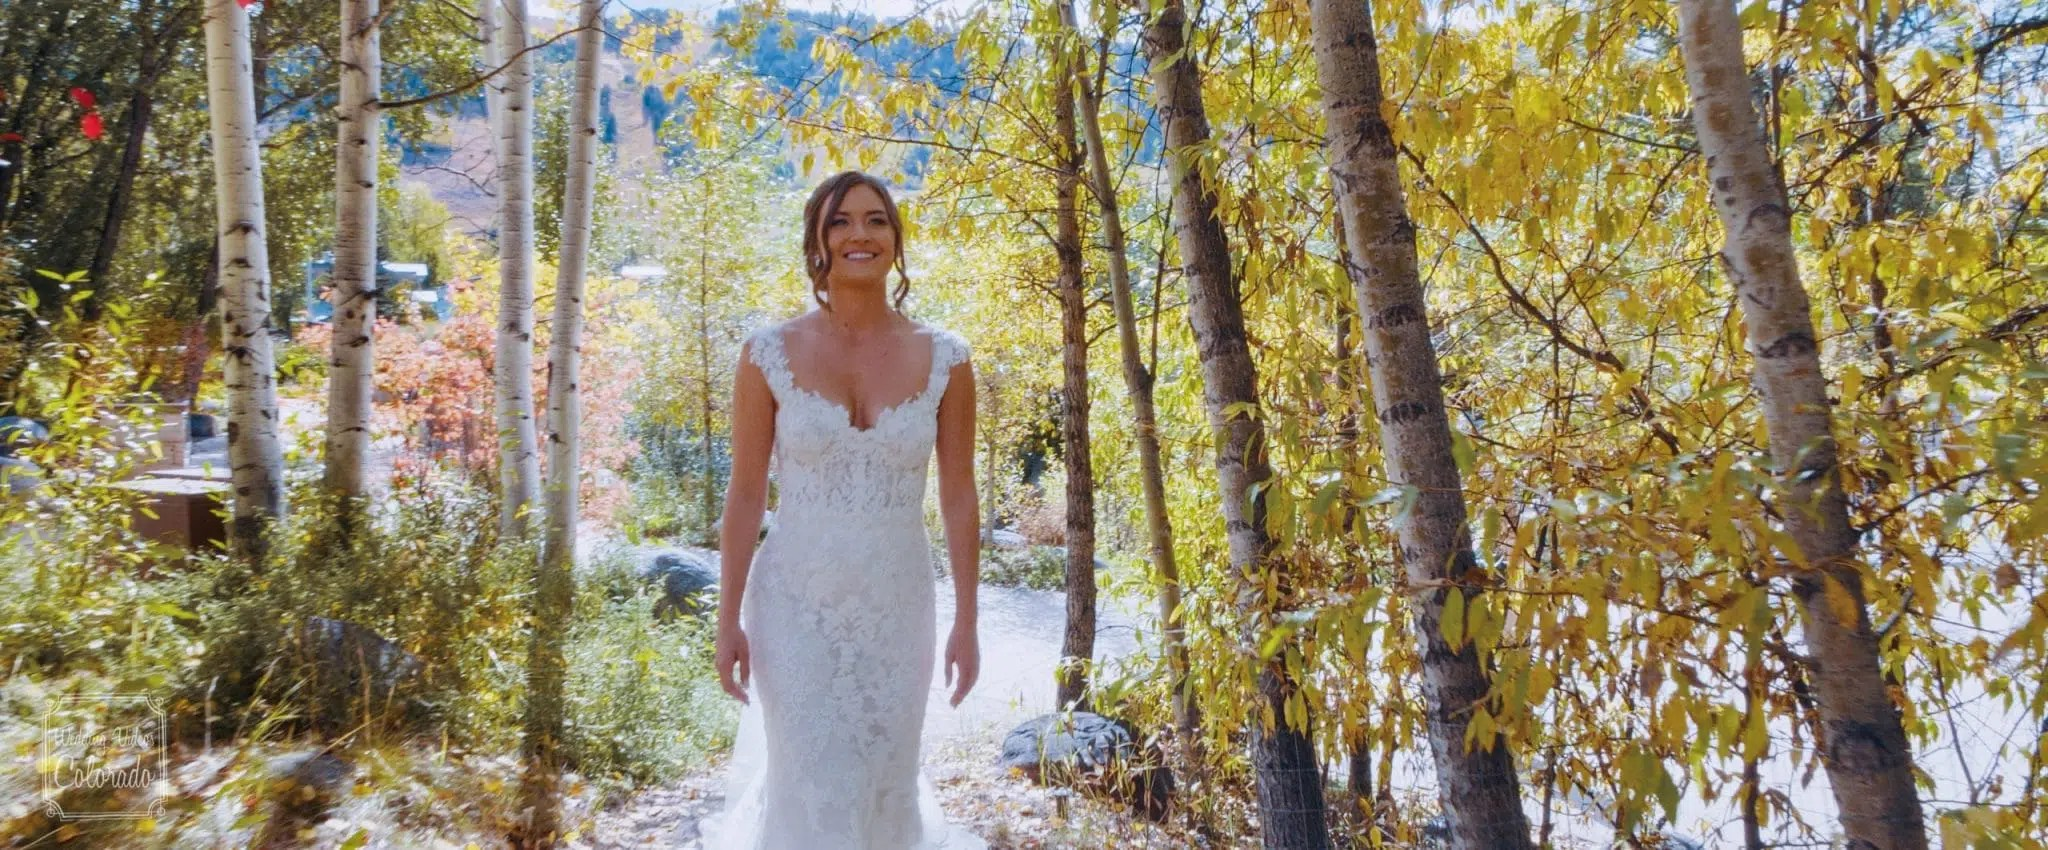 Neil Audrey Wedding Video Aspen Colorado